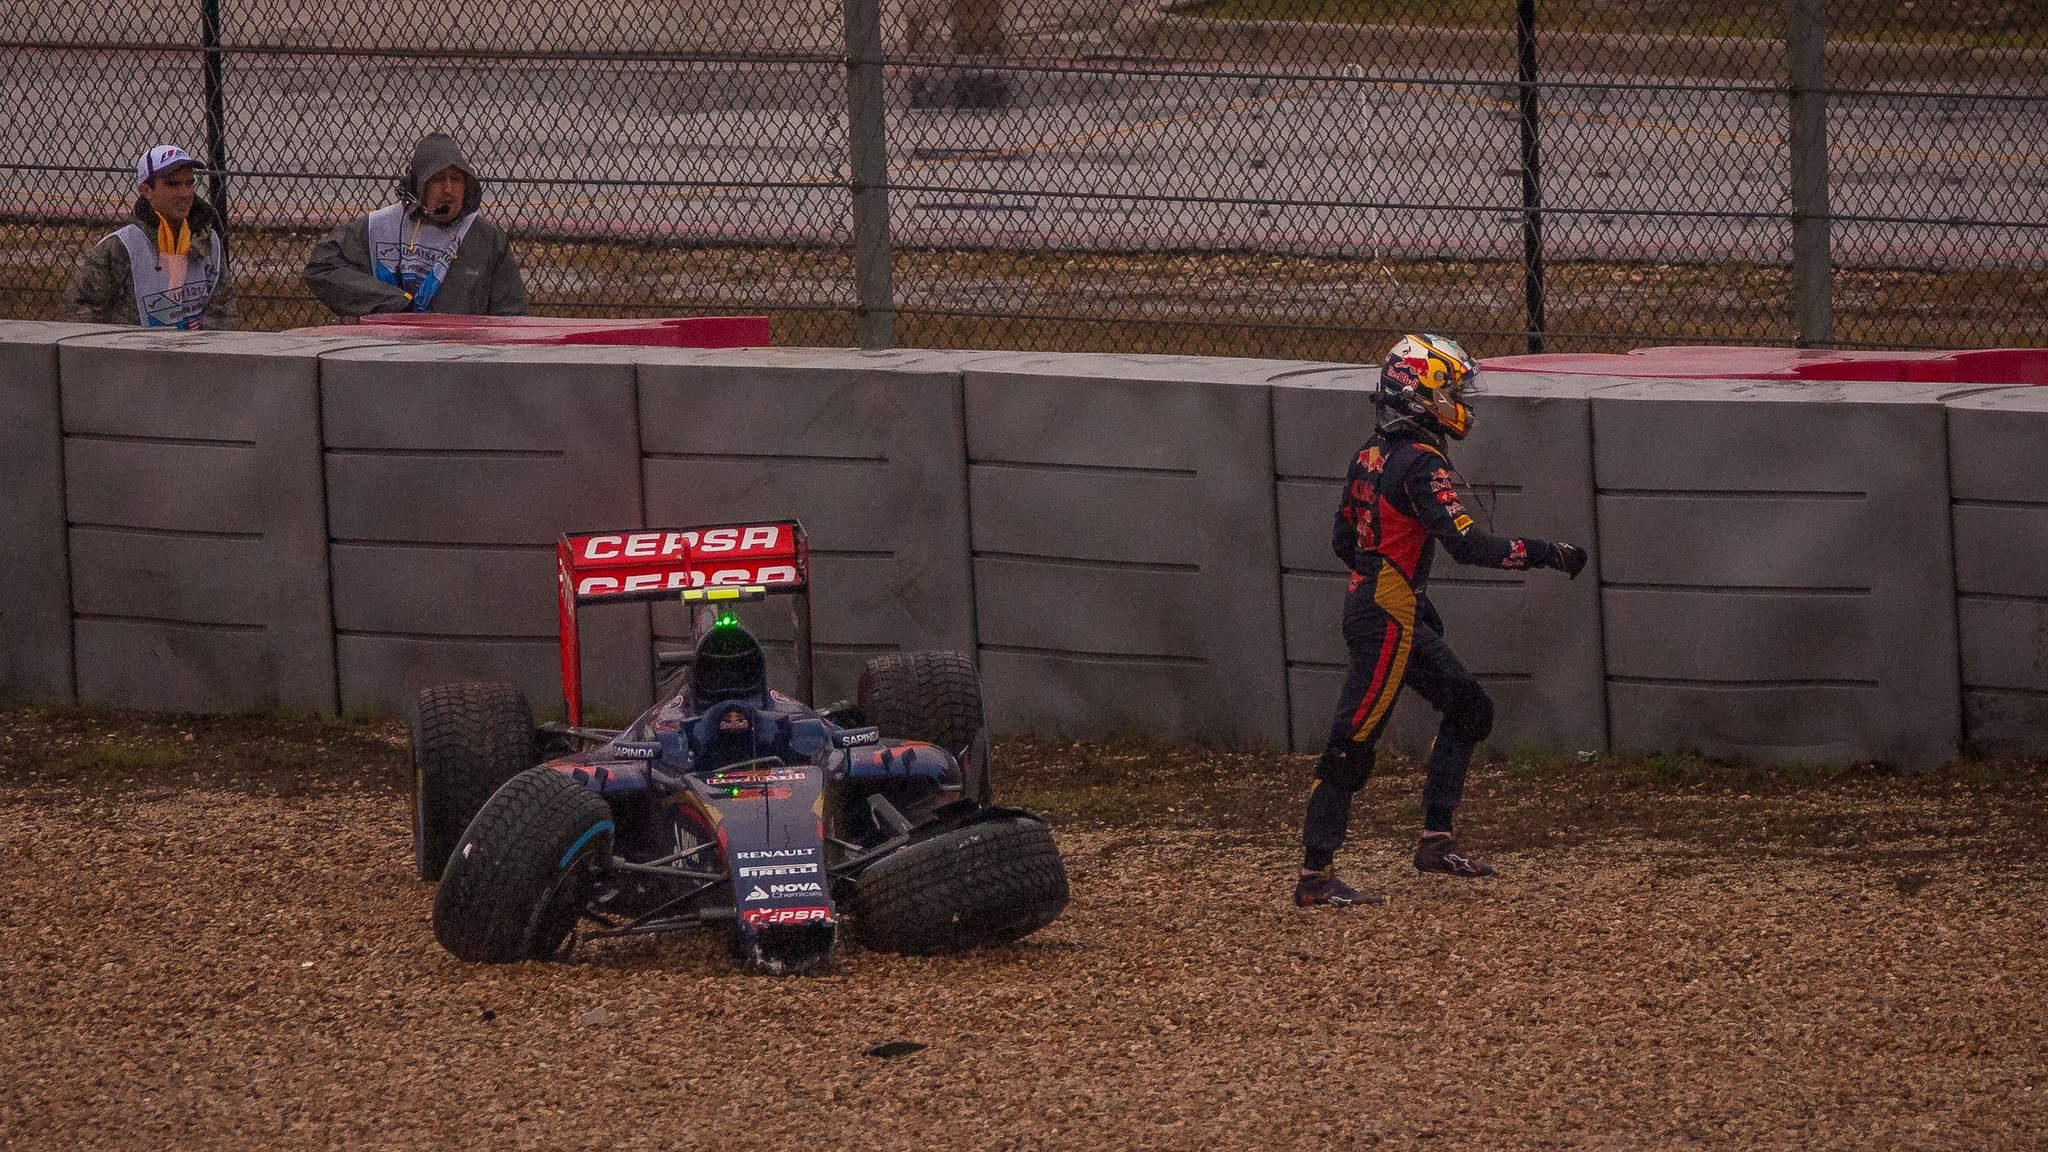 us grand prix10 Formula 1   2015 United States Grand Prix